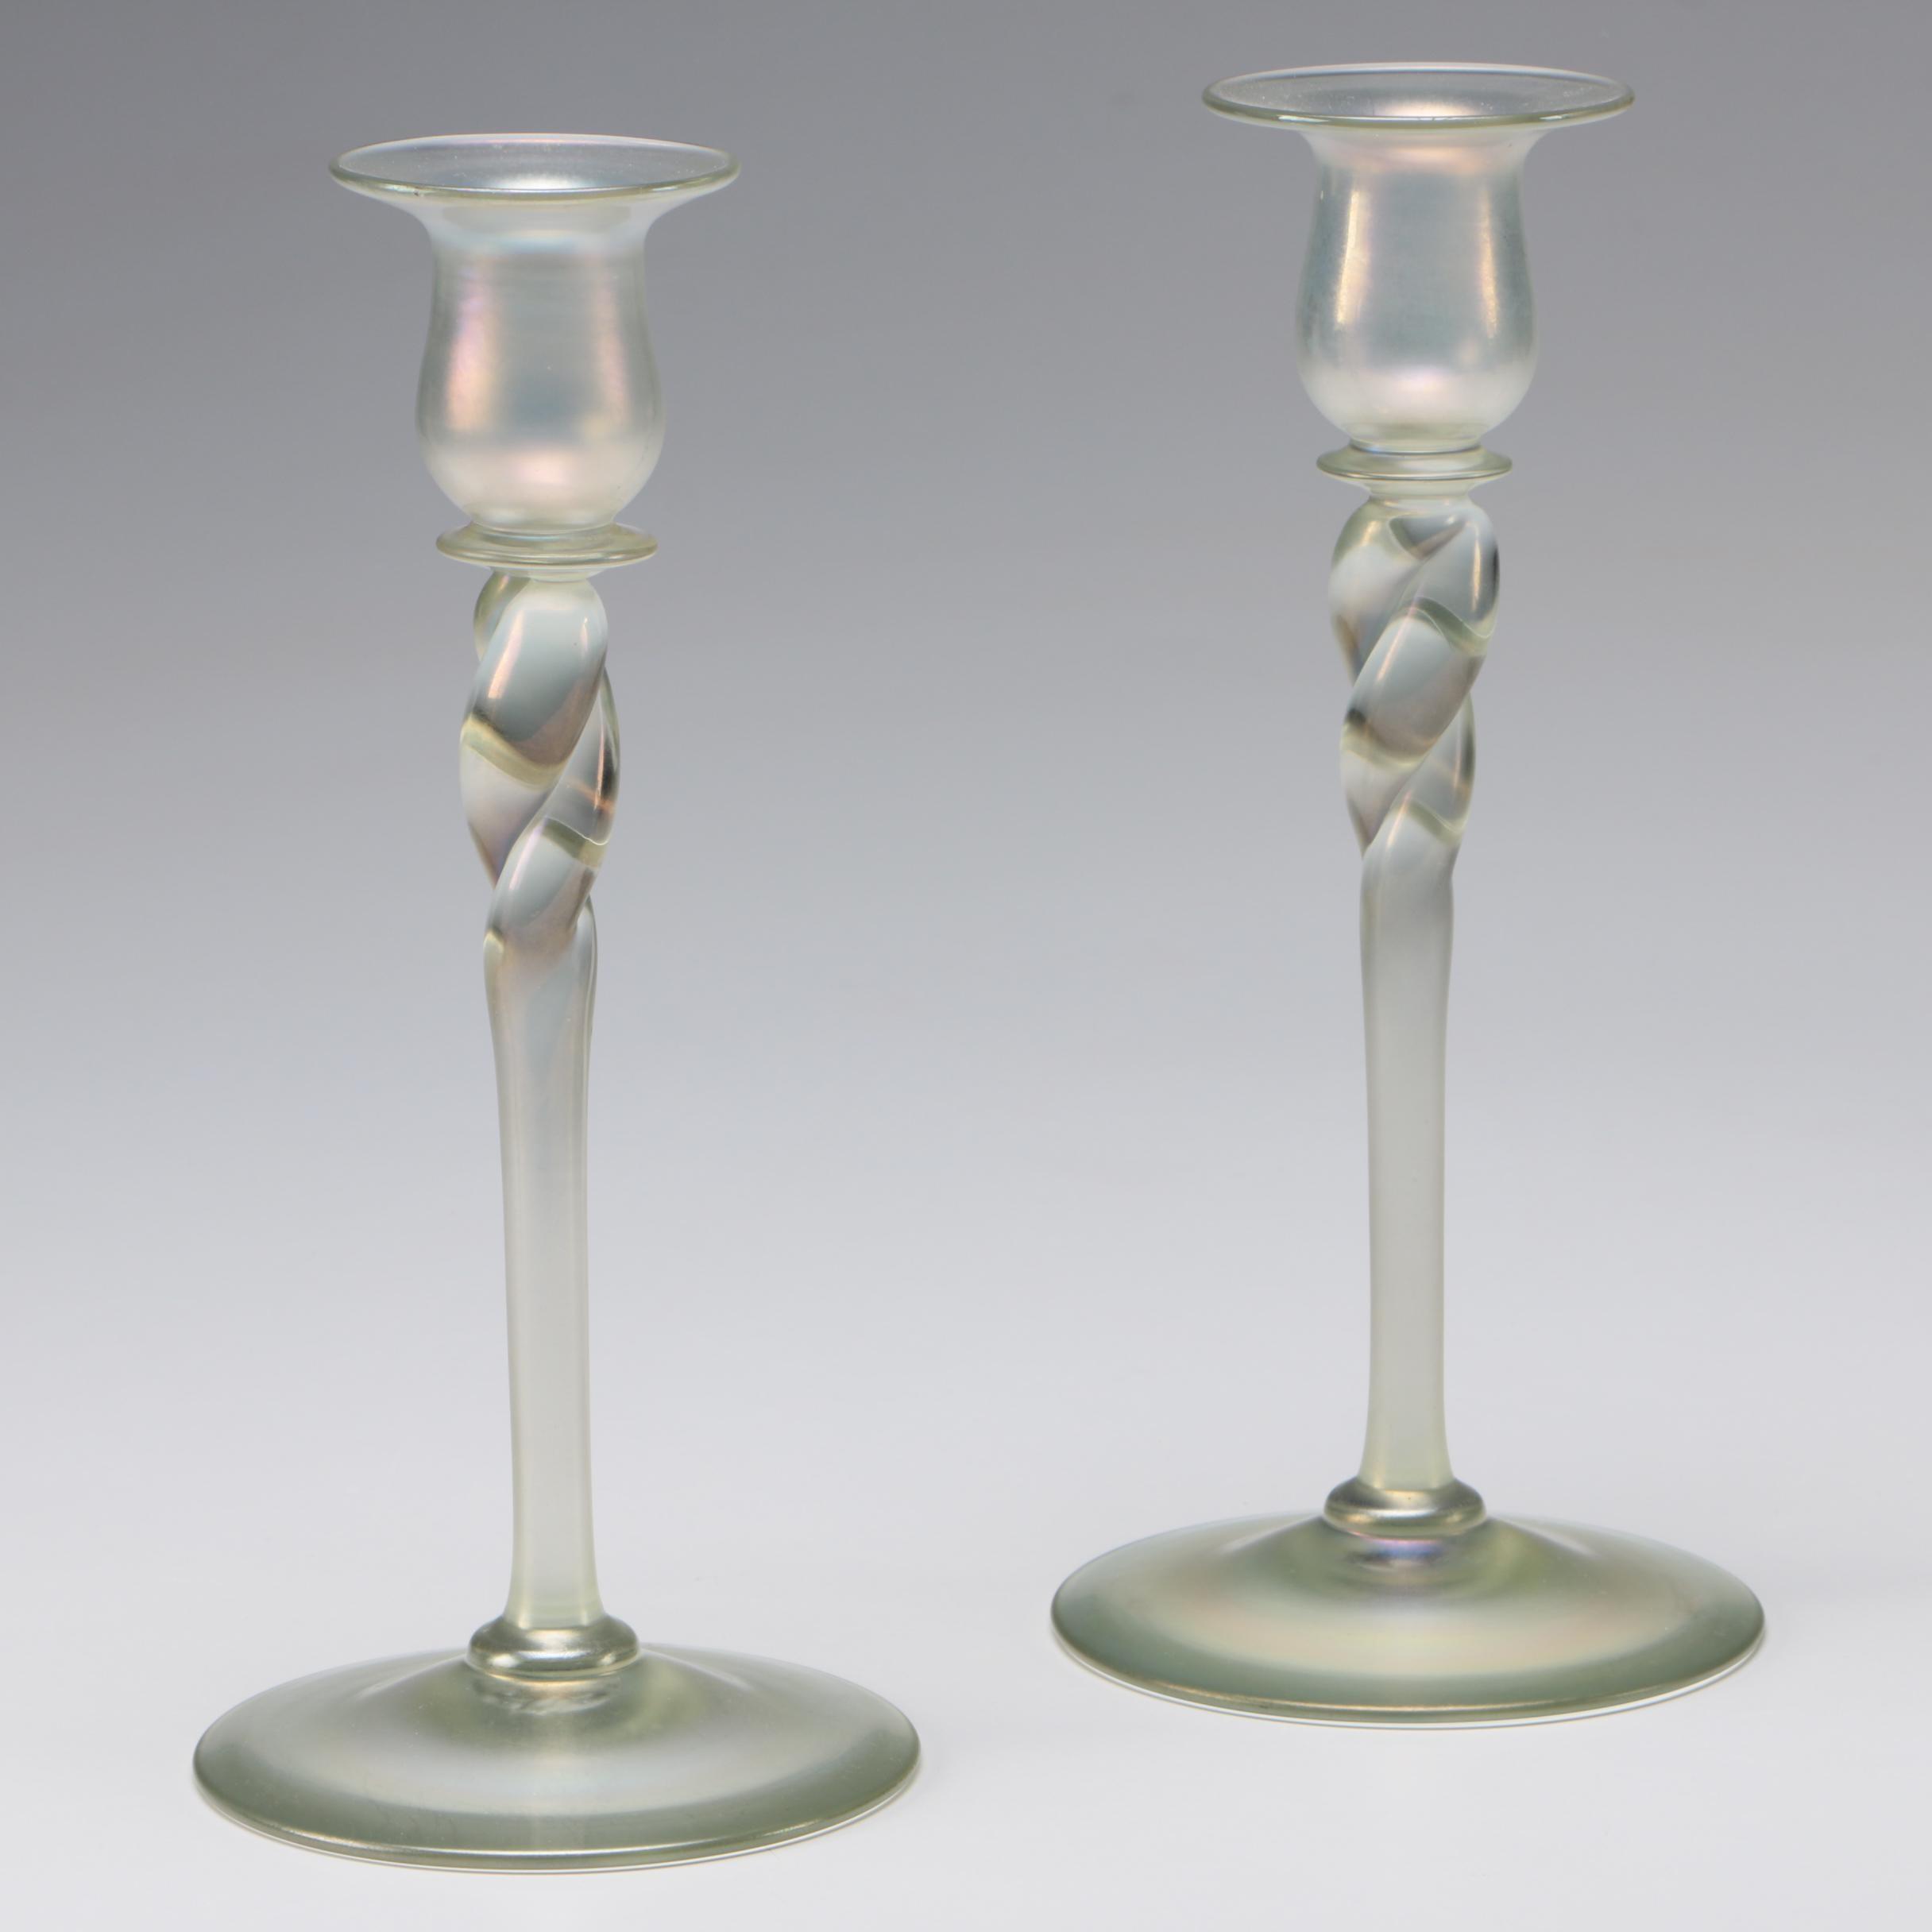 Steuben Aquamarine Art Glass Candlesticks, Early/Mid-Century